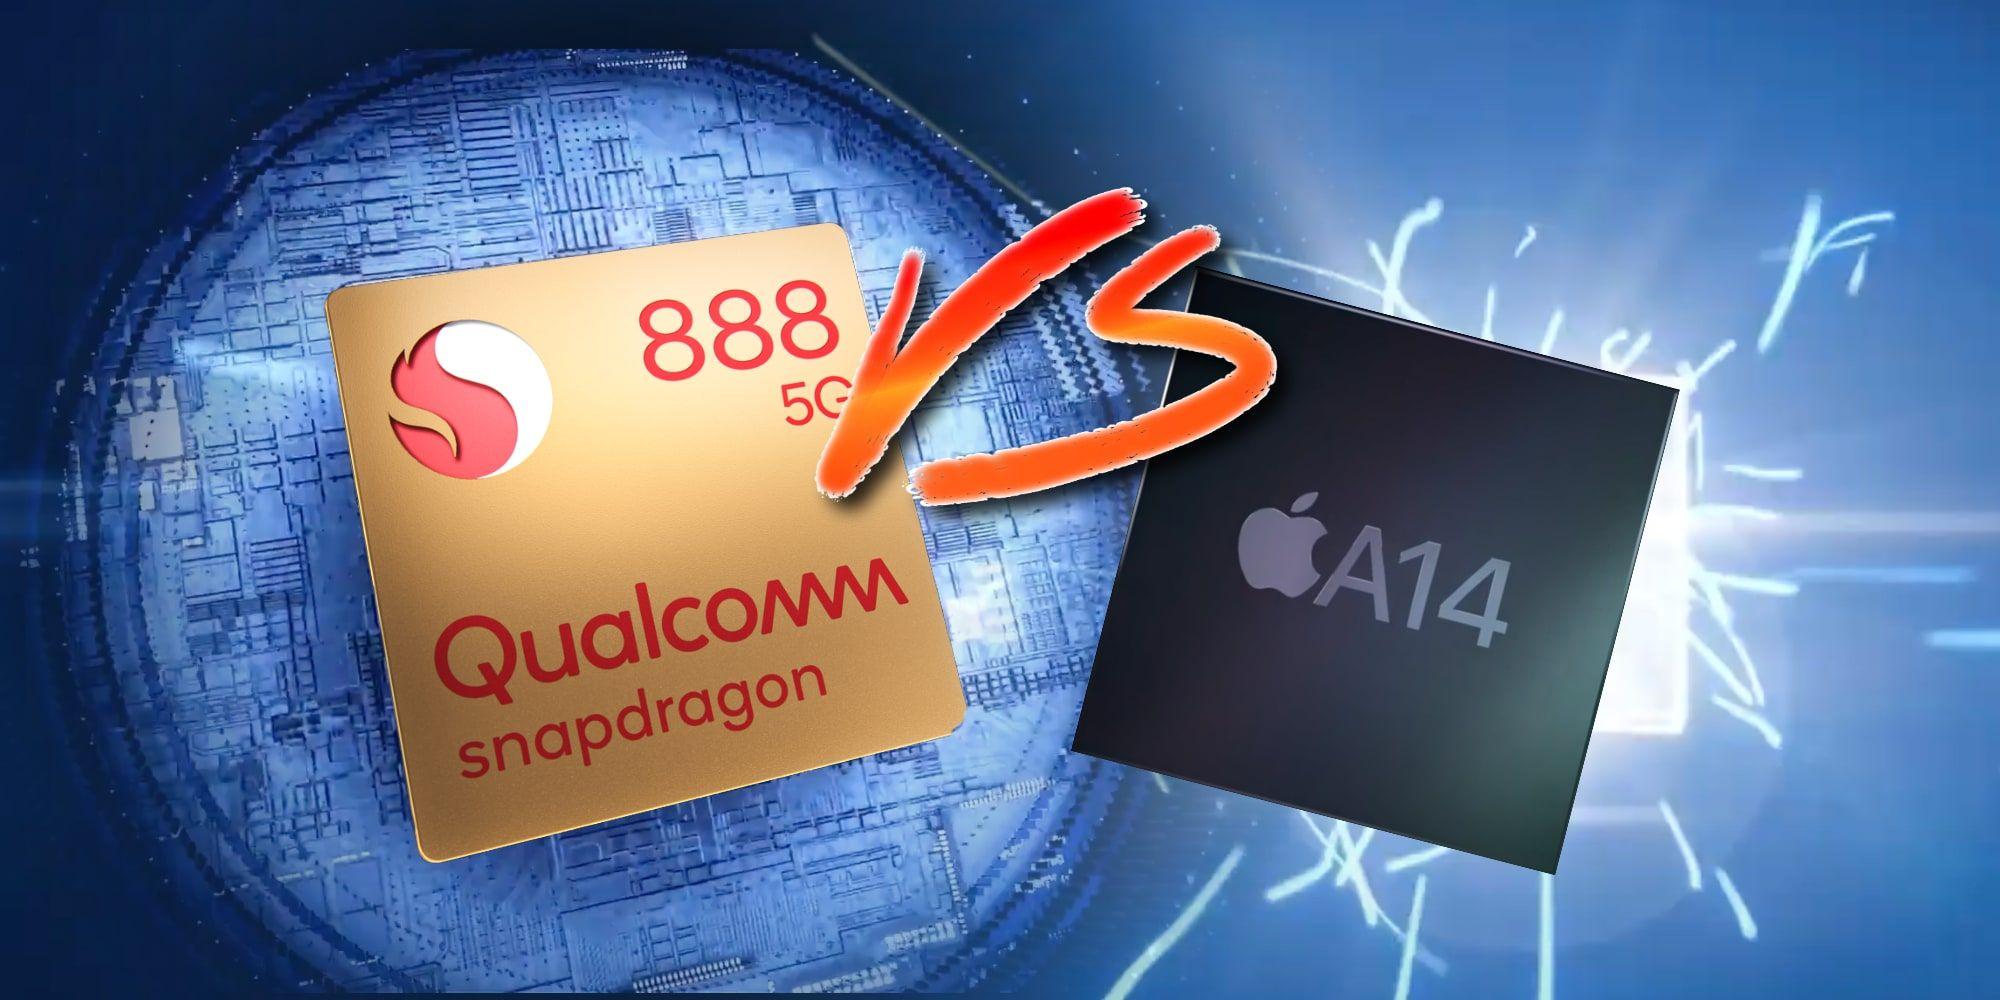 qualcomm snapdragon 888 vs apple a14 chip شیائومی می ۱۱, شیائومی